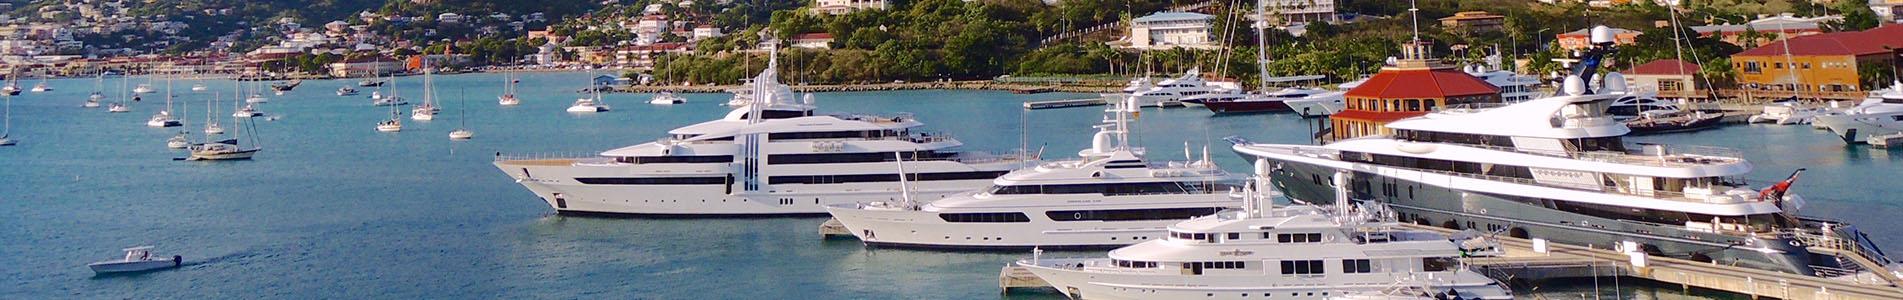 Superyachtcharter karibik